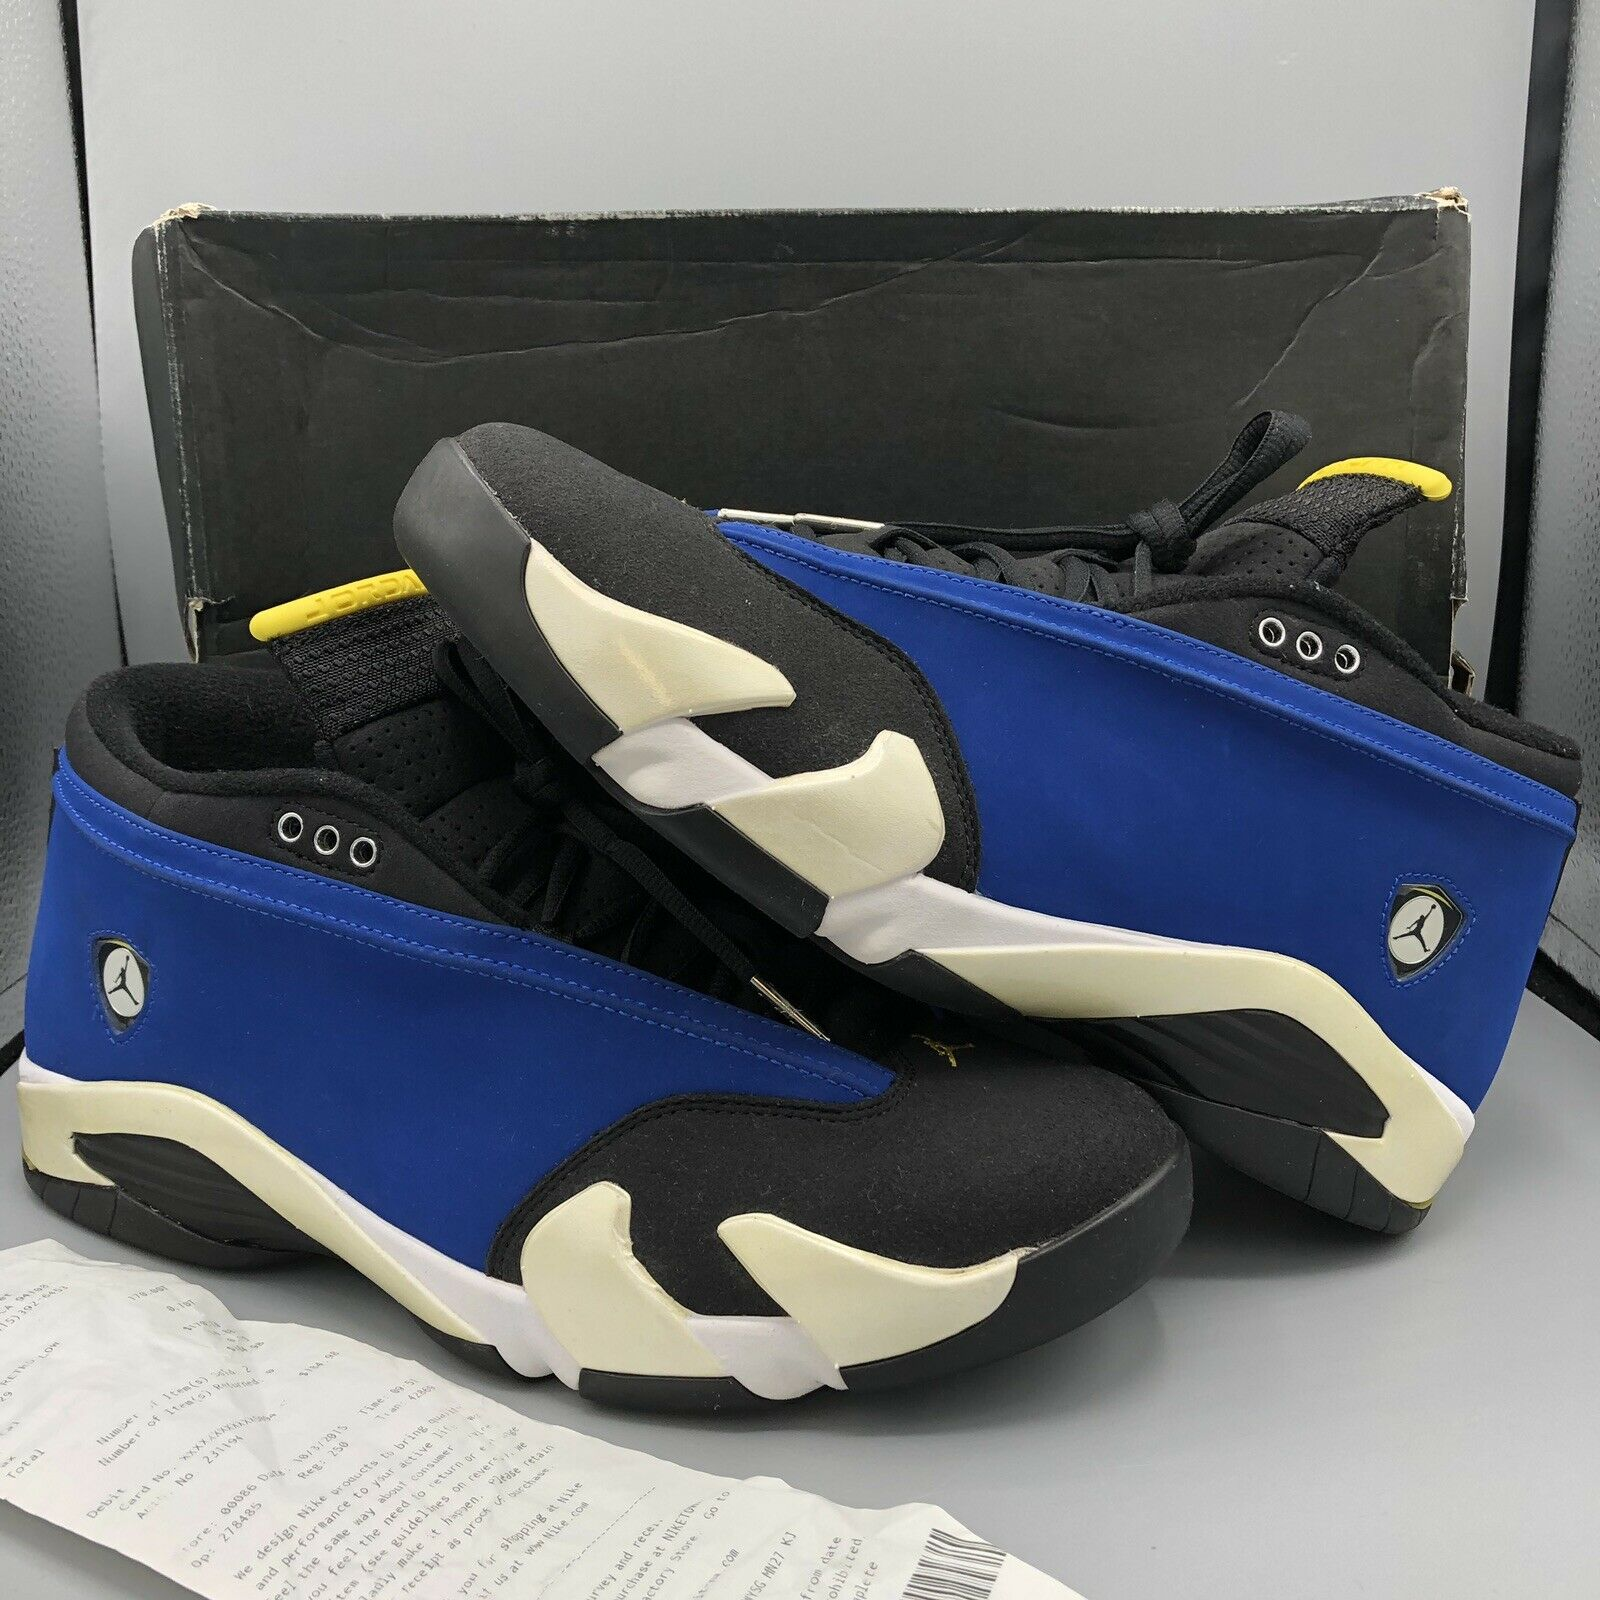 5bb8339651 Jordan Retro XIV Low Laney bluee bluee bluee Maize Yellow Black 807511 405  Sz 12 Warriors